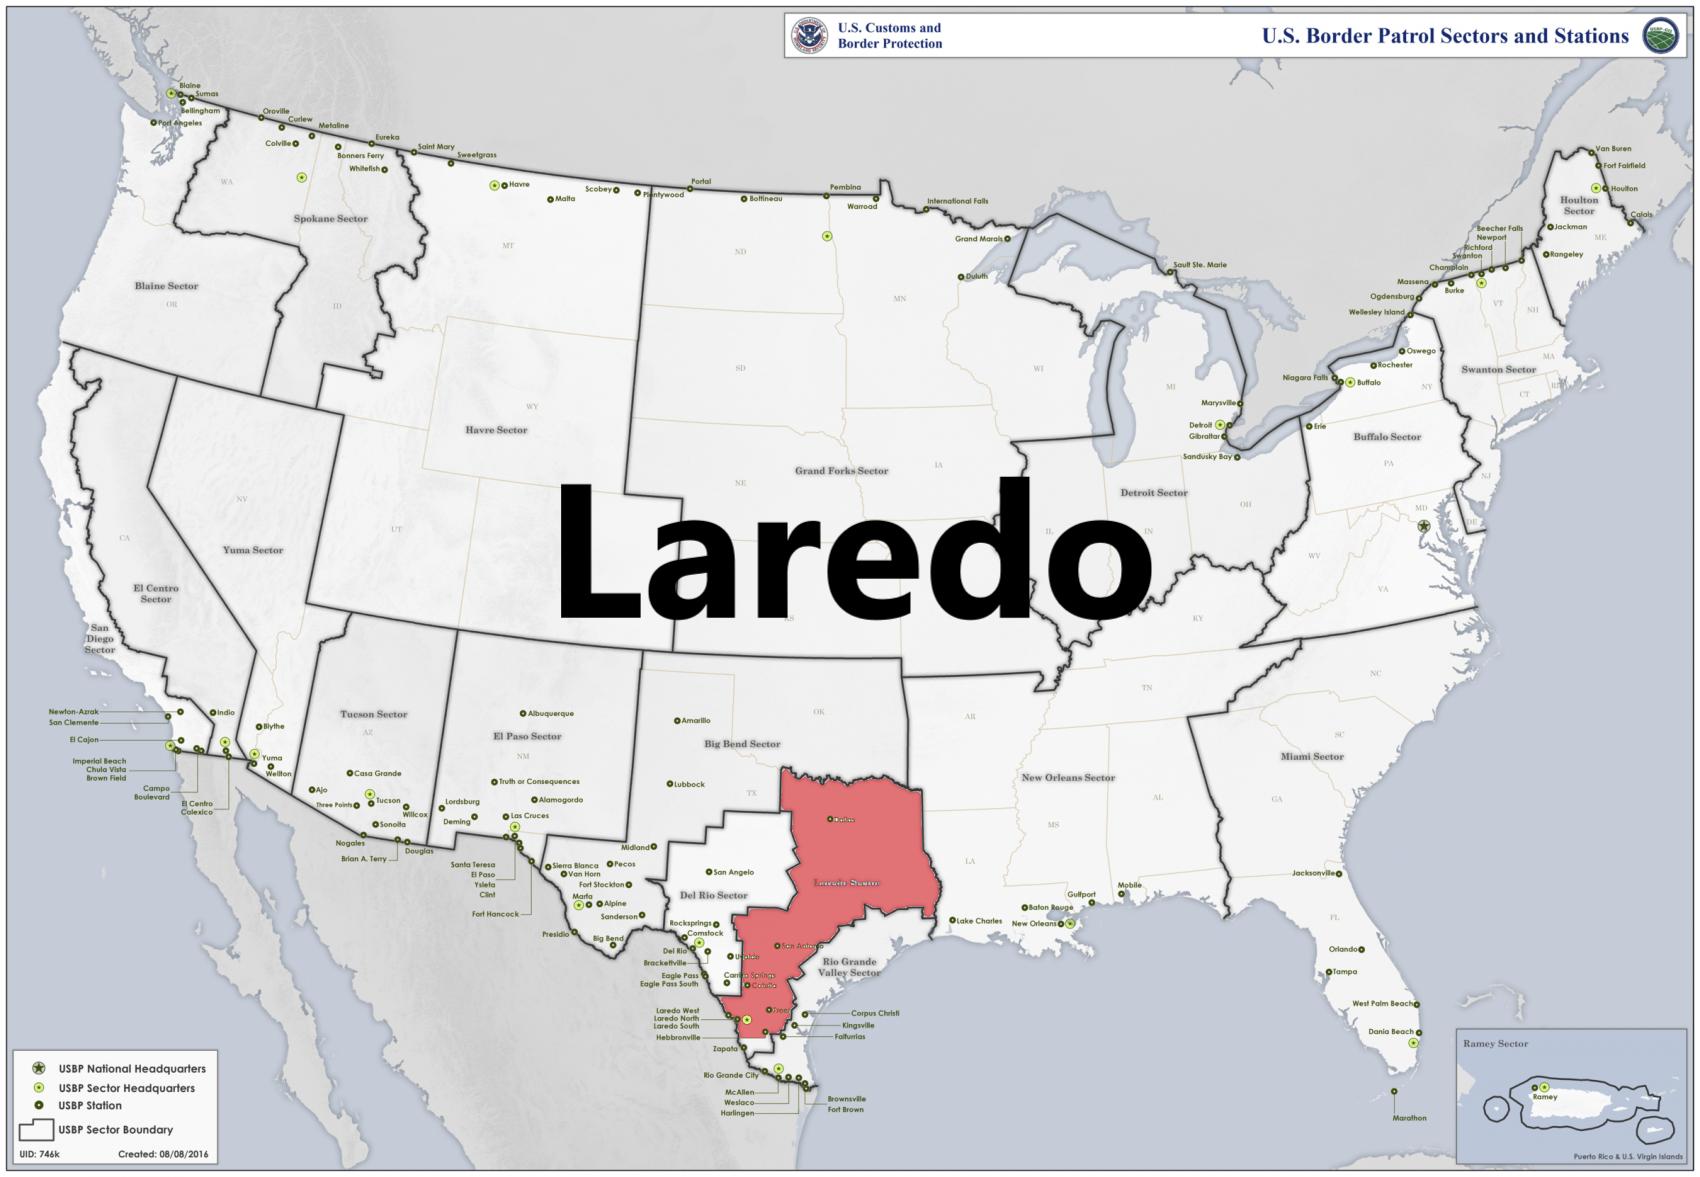 Border patrol sectors map - Laredo.png